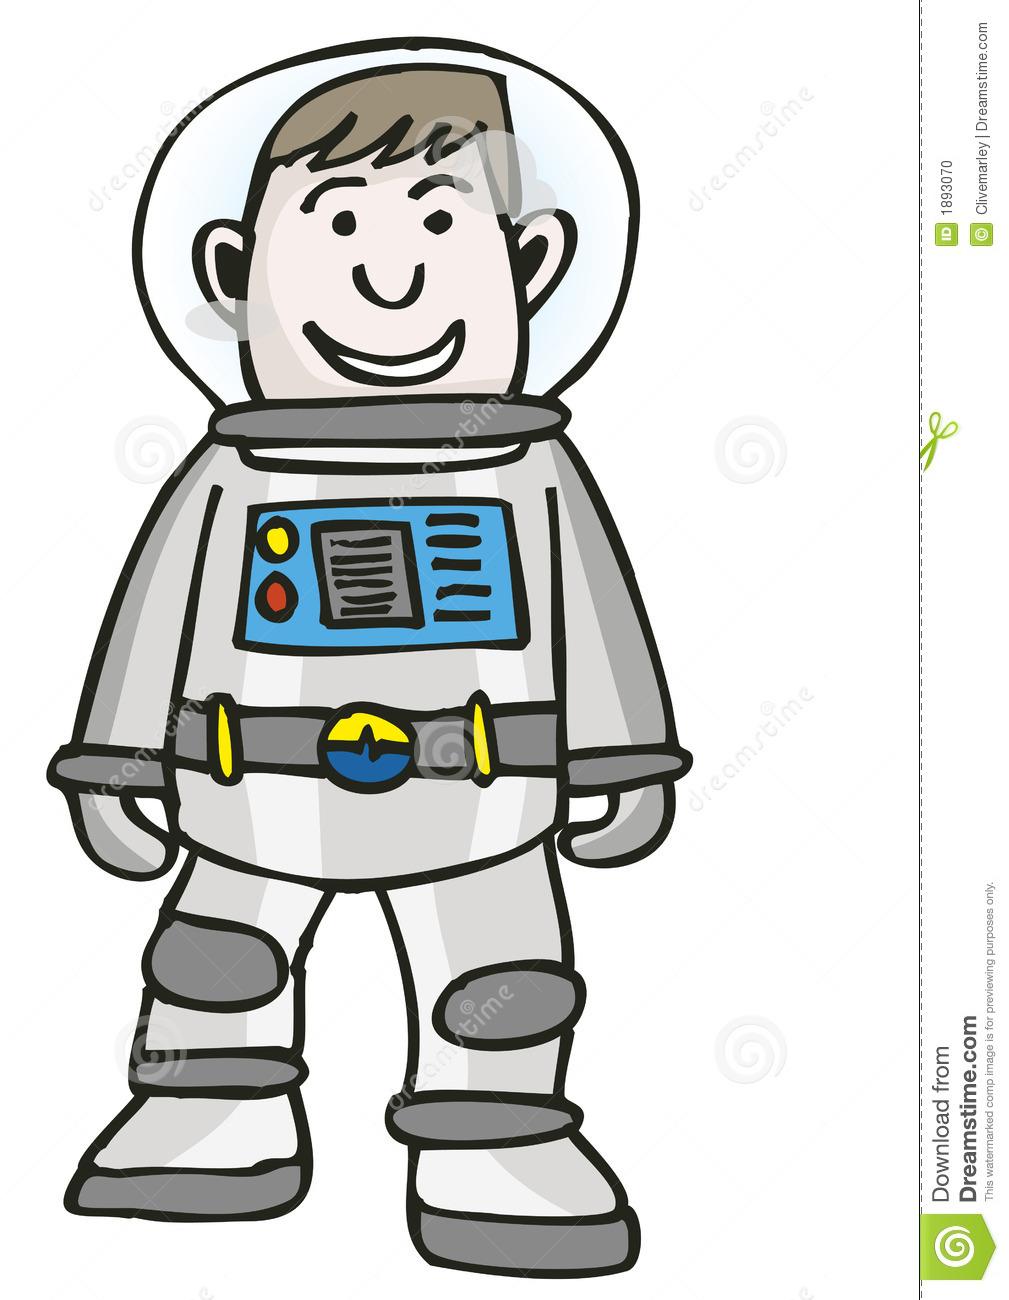 Spaceman-Spaceman-12